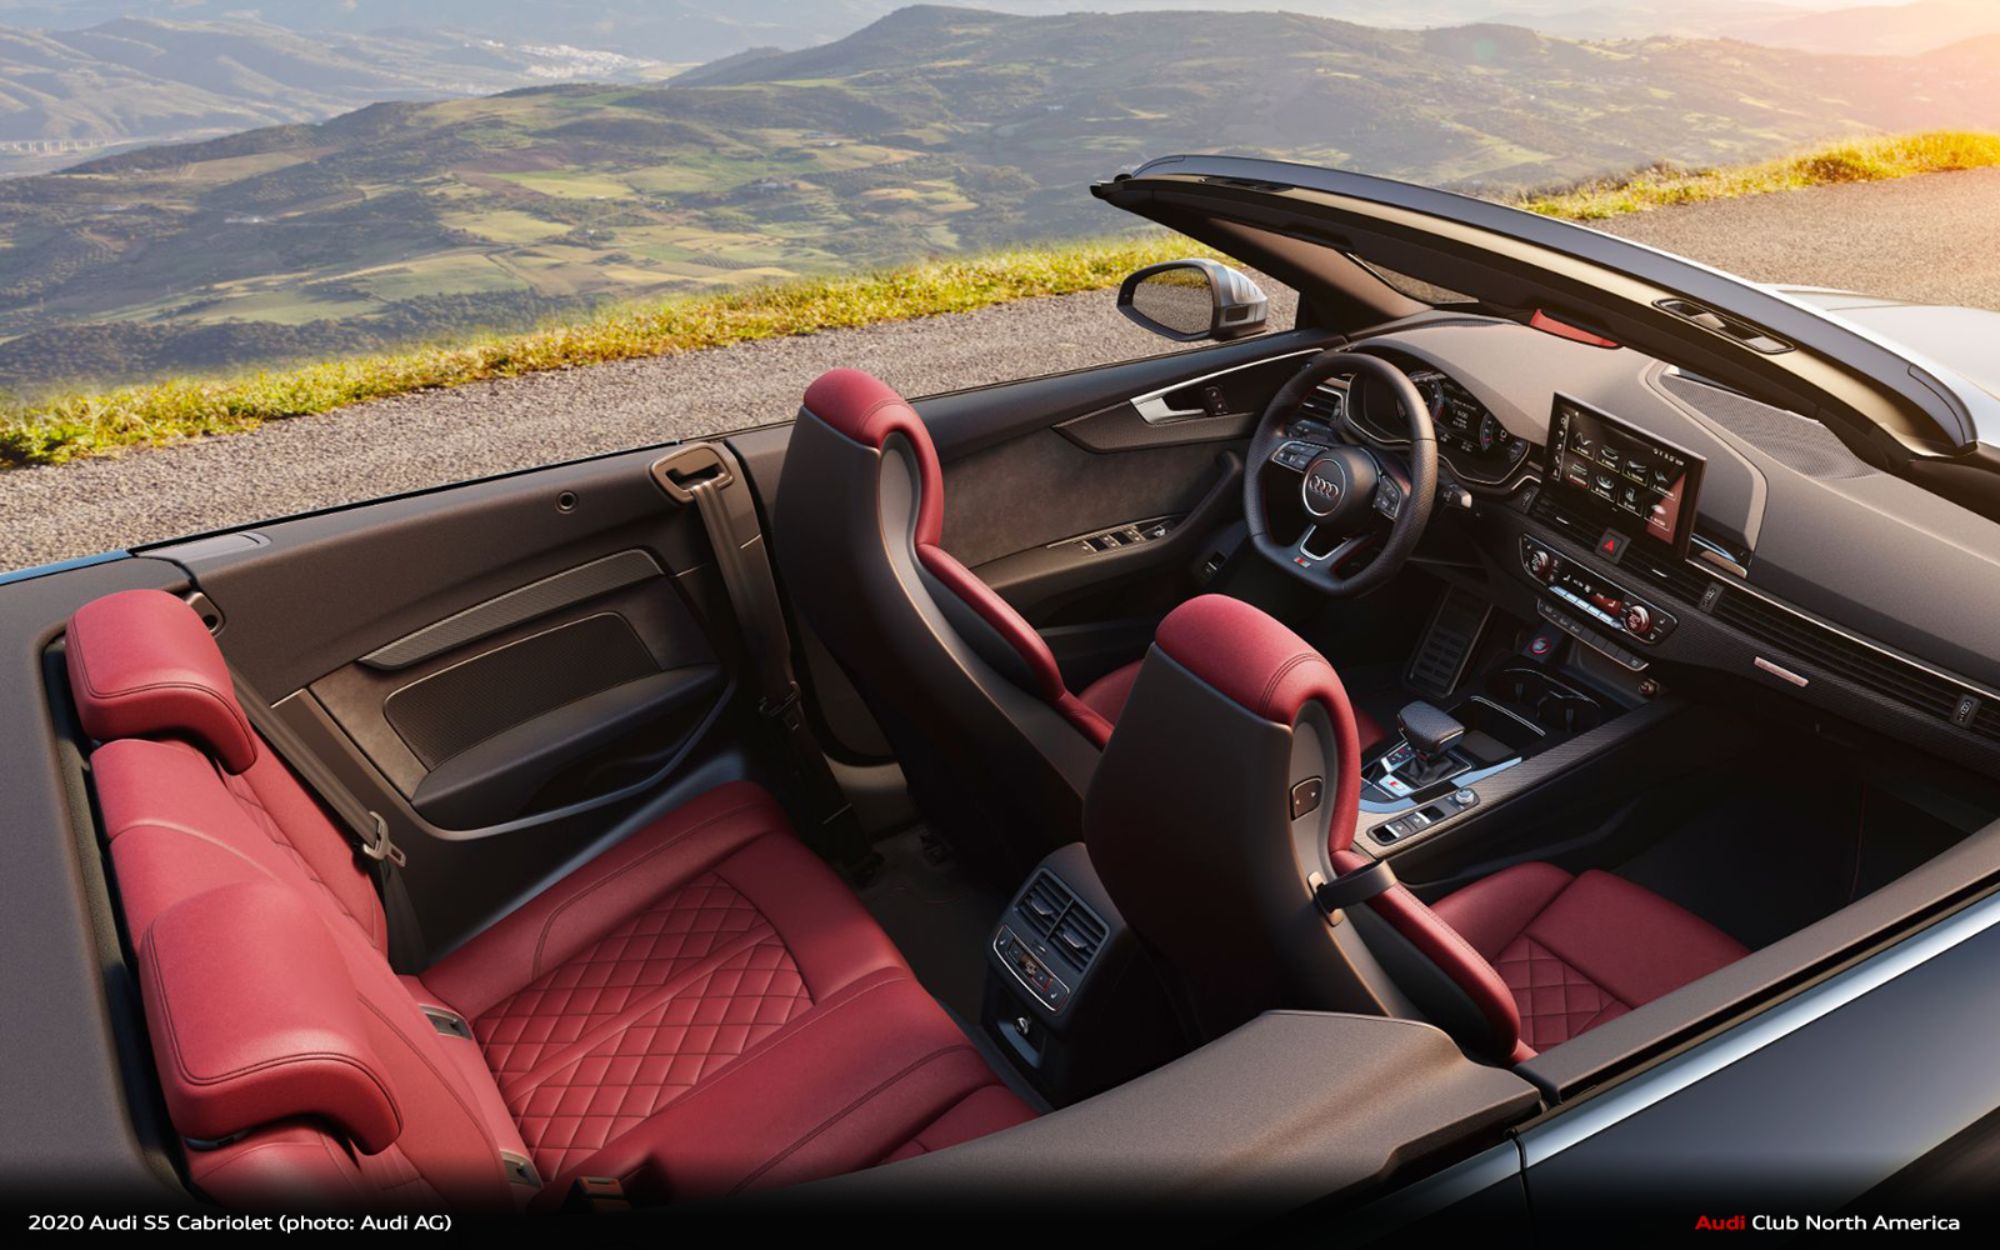 2020 Audi S5 Cabriolet 17 Audi Club North America